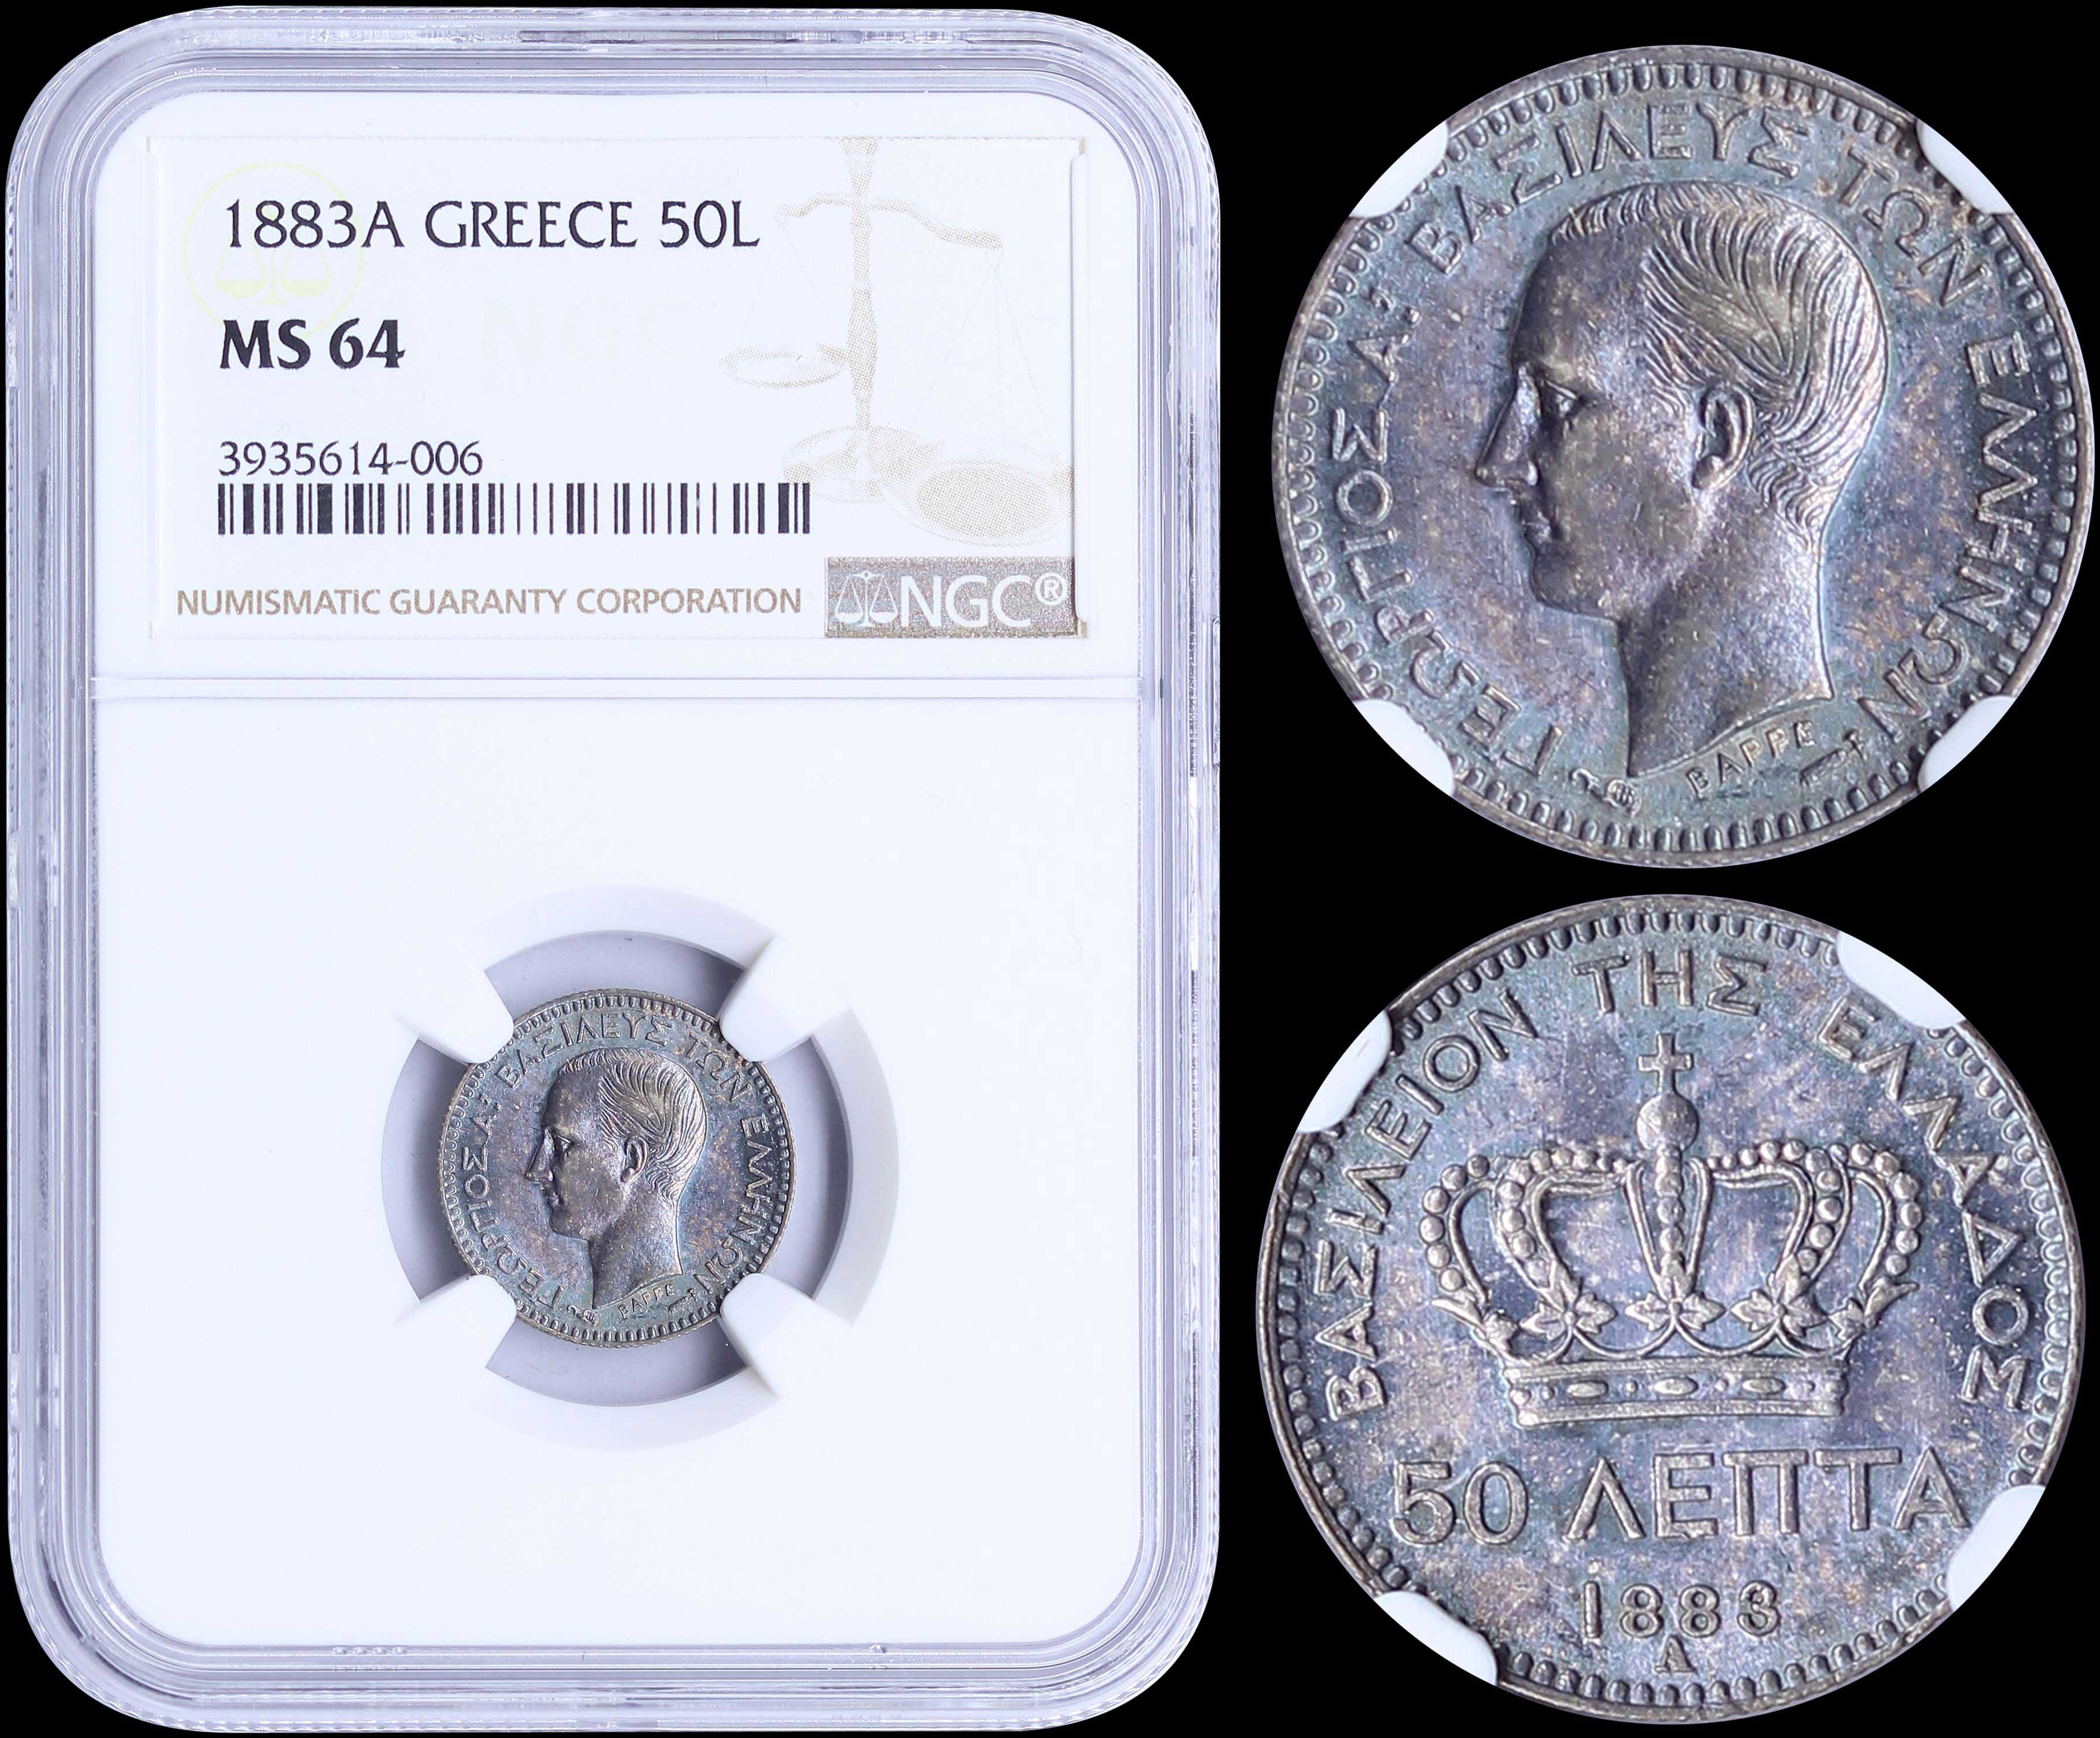 Lot 8146 - -  COINS & TOKENS king george i -  A. Karamitsos Public & Live Bid Auction 644 Coins, Medals & Banknotes